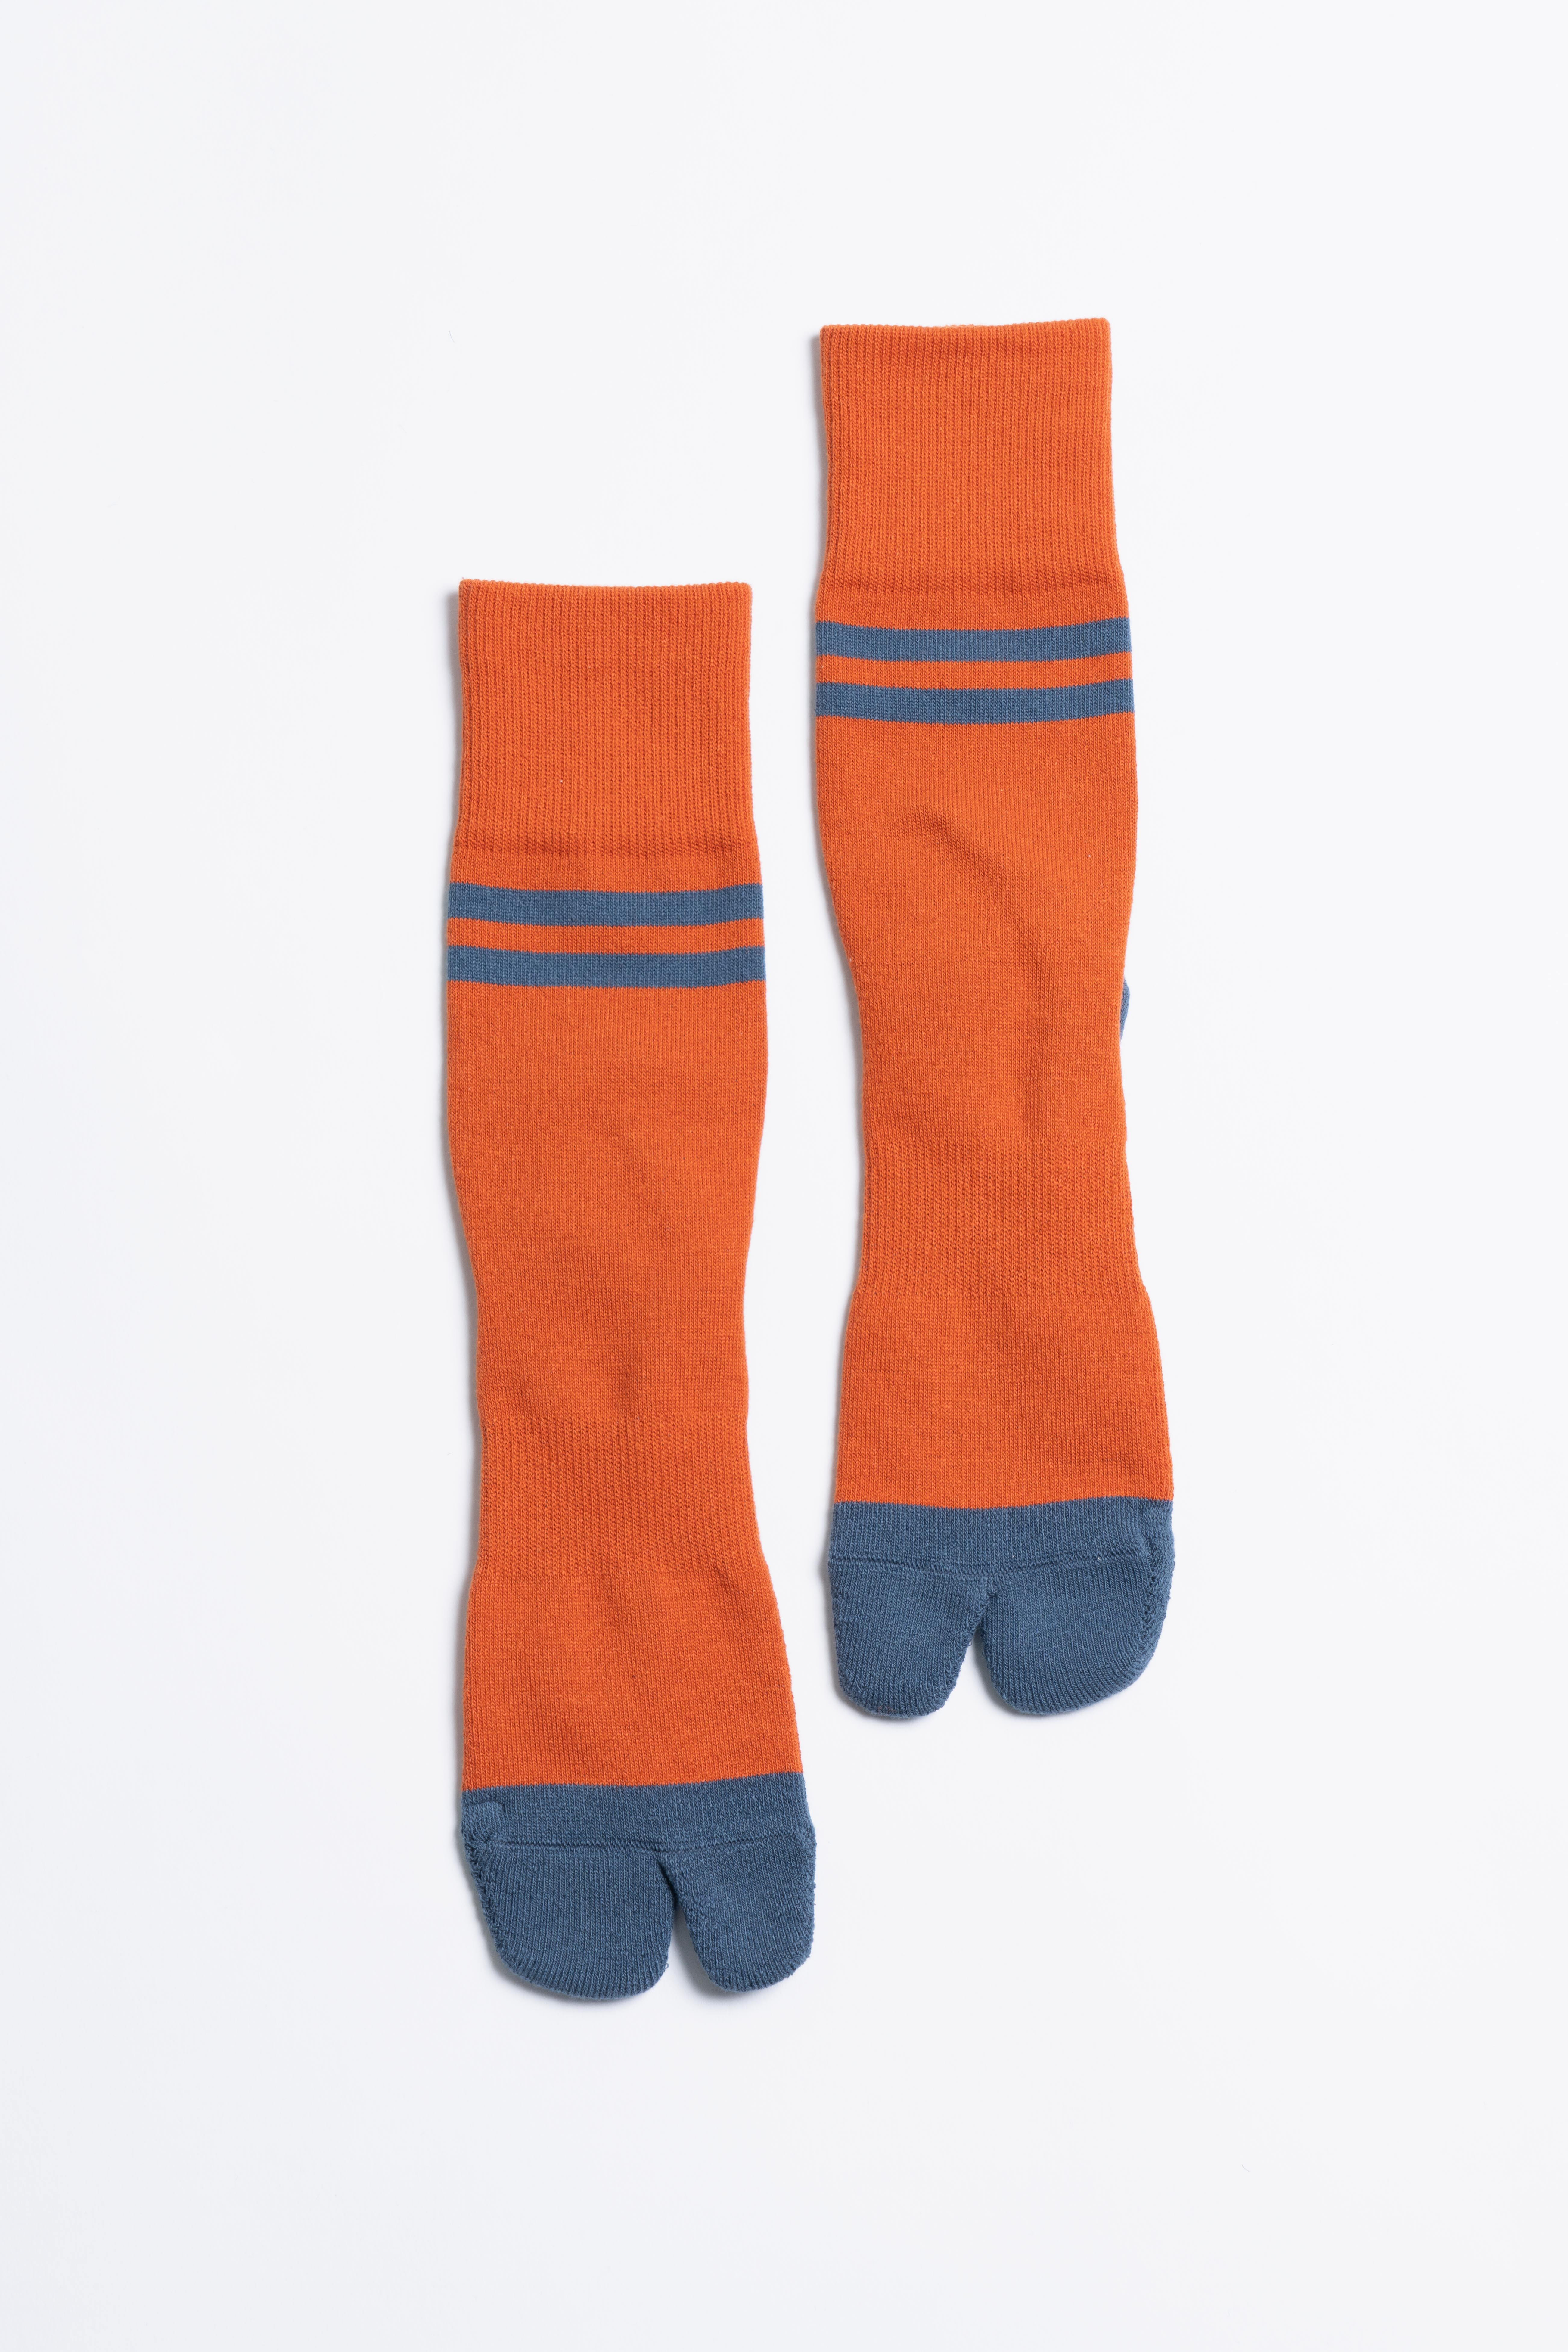 '90s Line Socks(Autumn Orange × Road Blue)